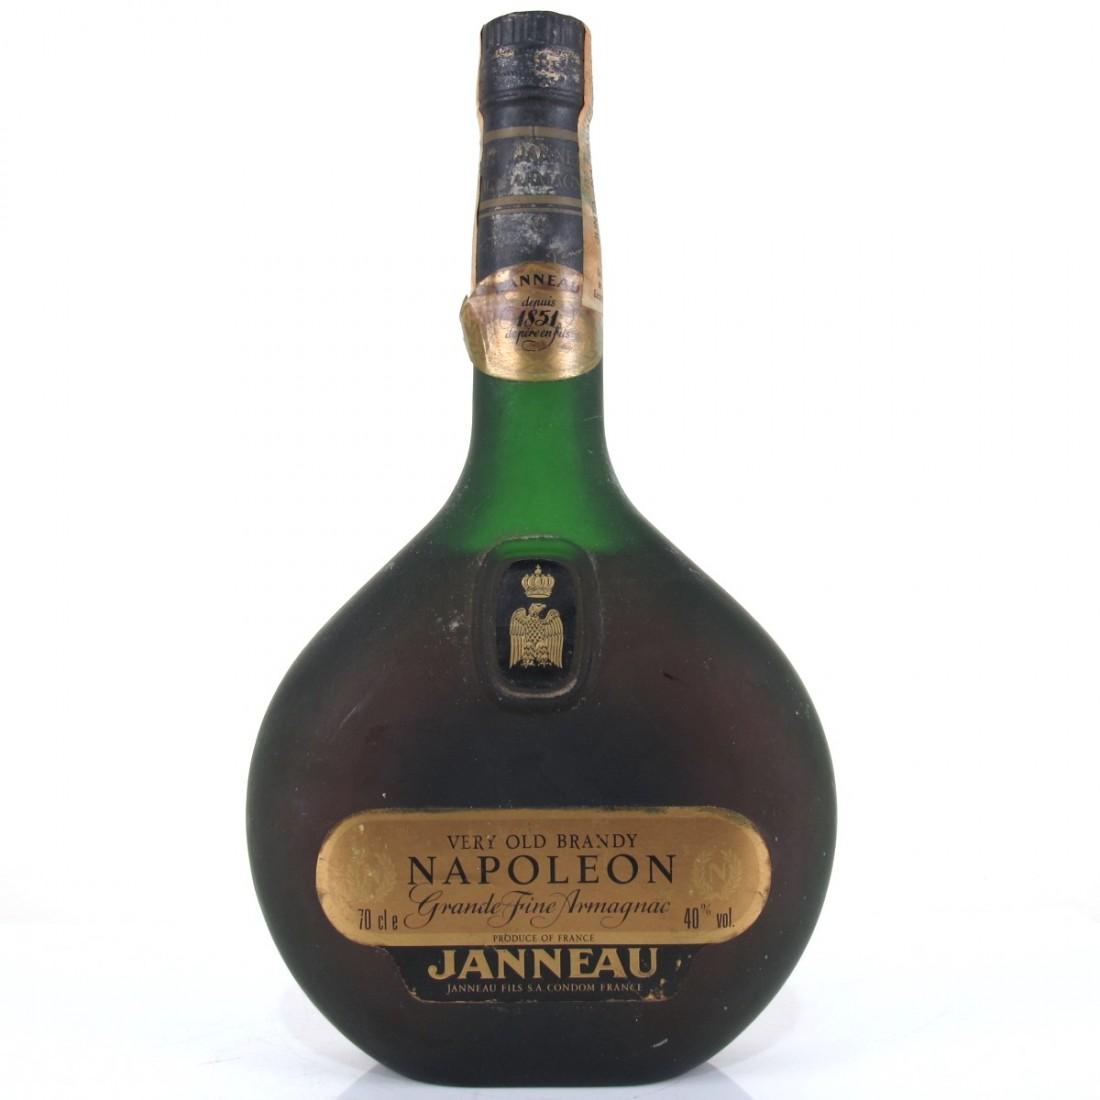 Janneau Napoleon Grande Fine Armagnac